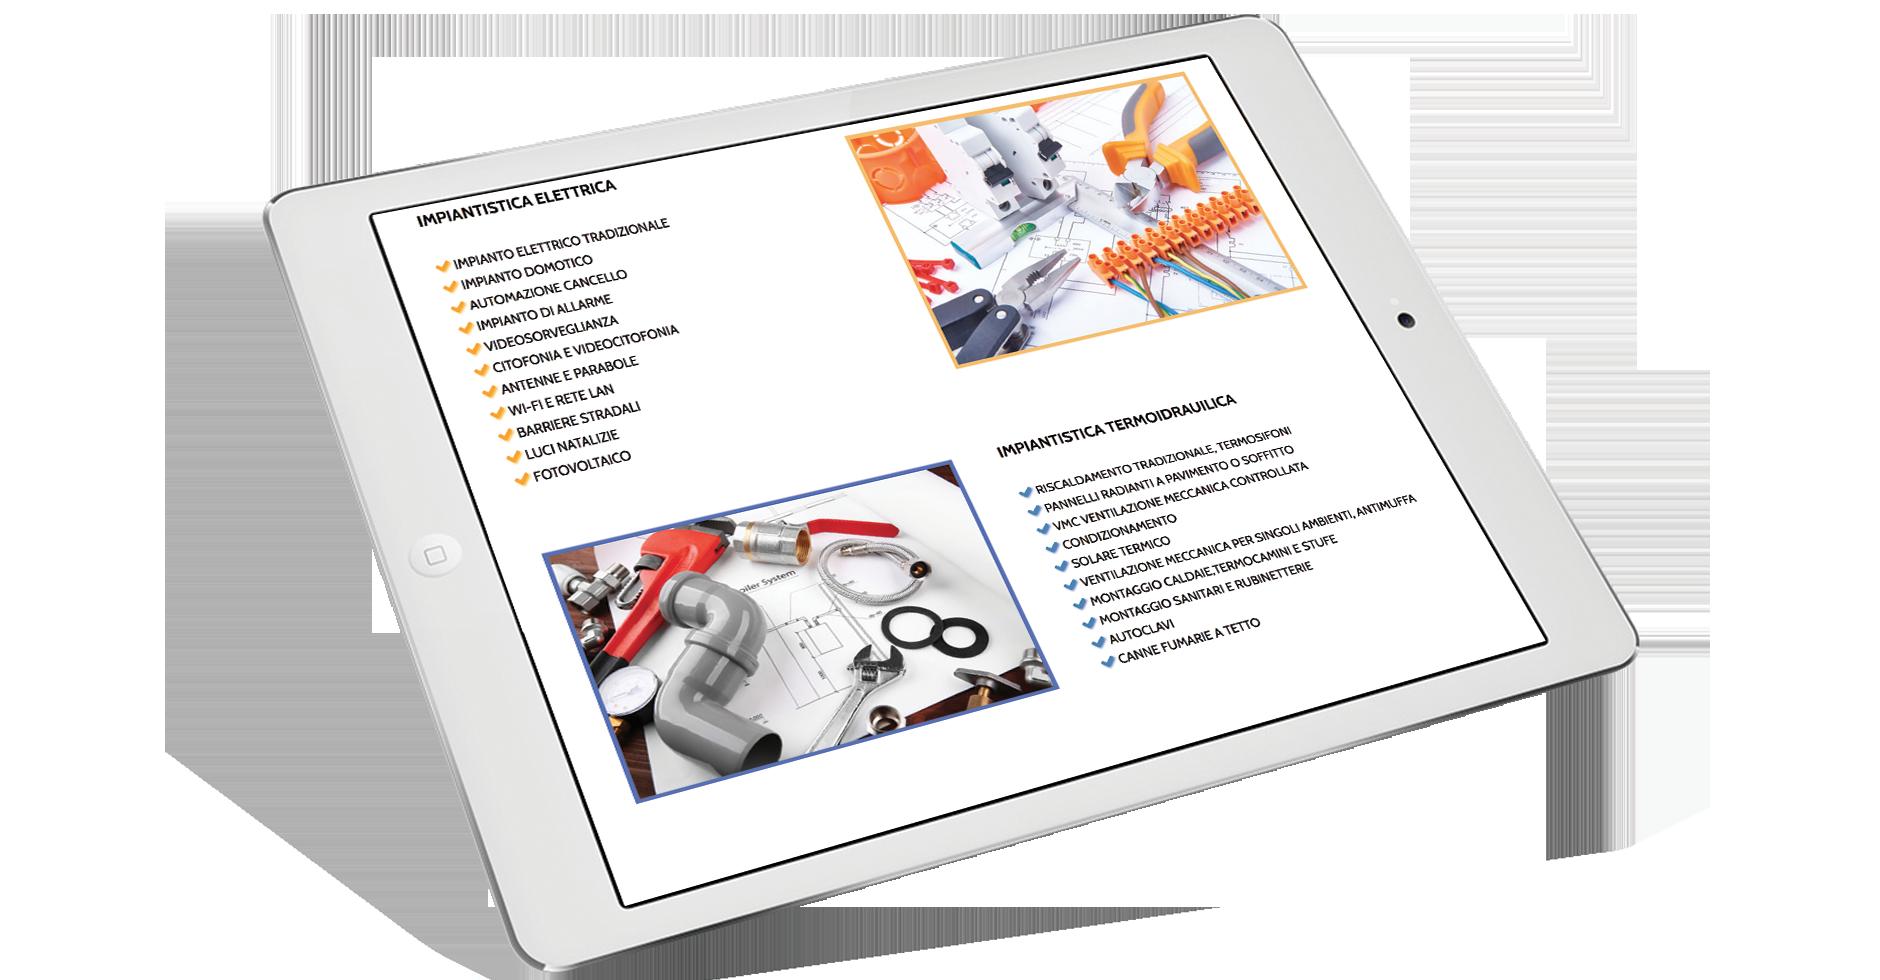 portfolio-prontoidraulicoelettricista-dettaglio2